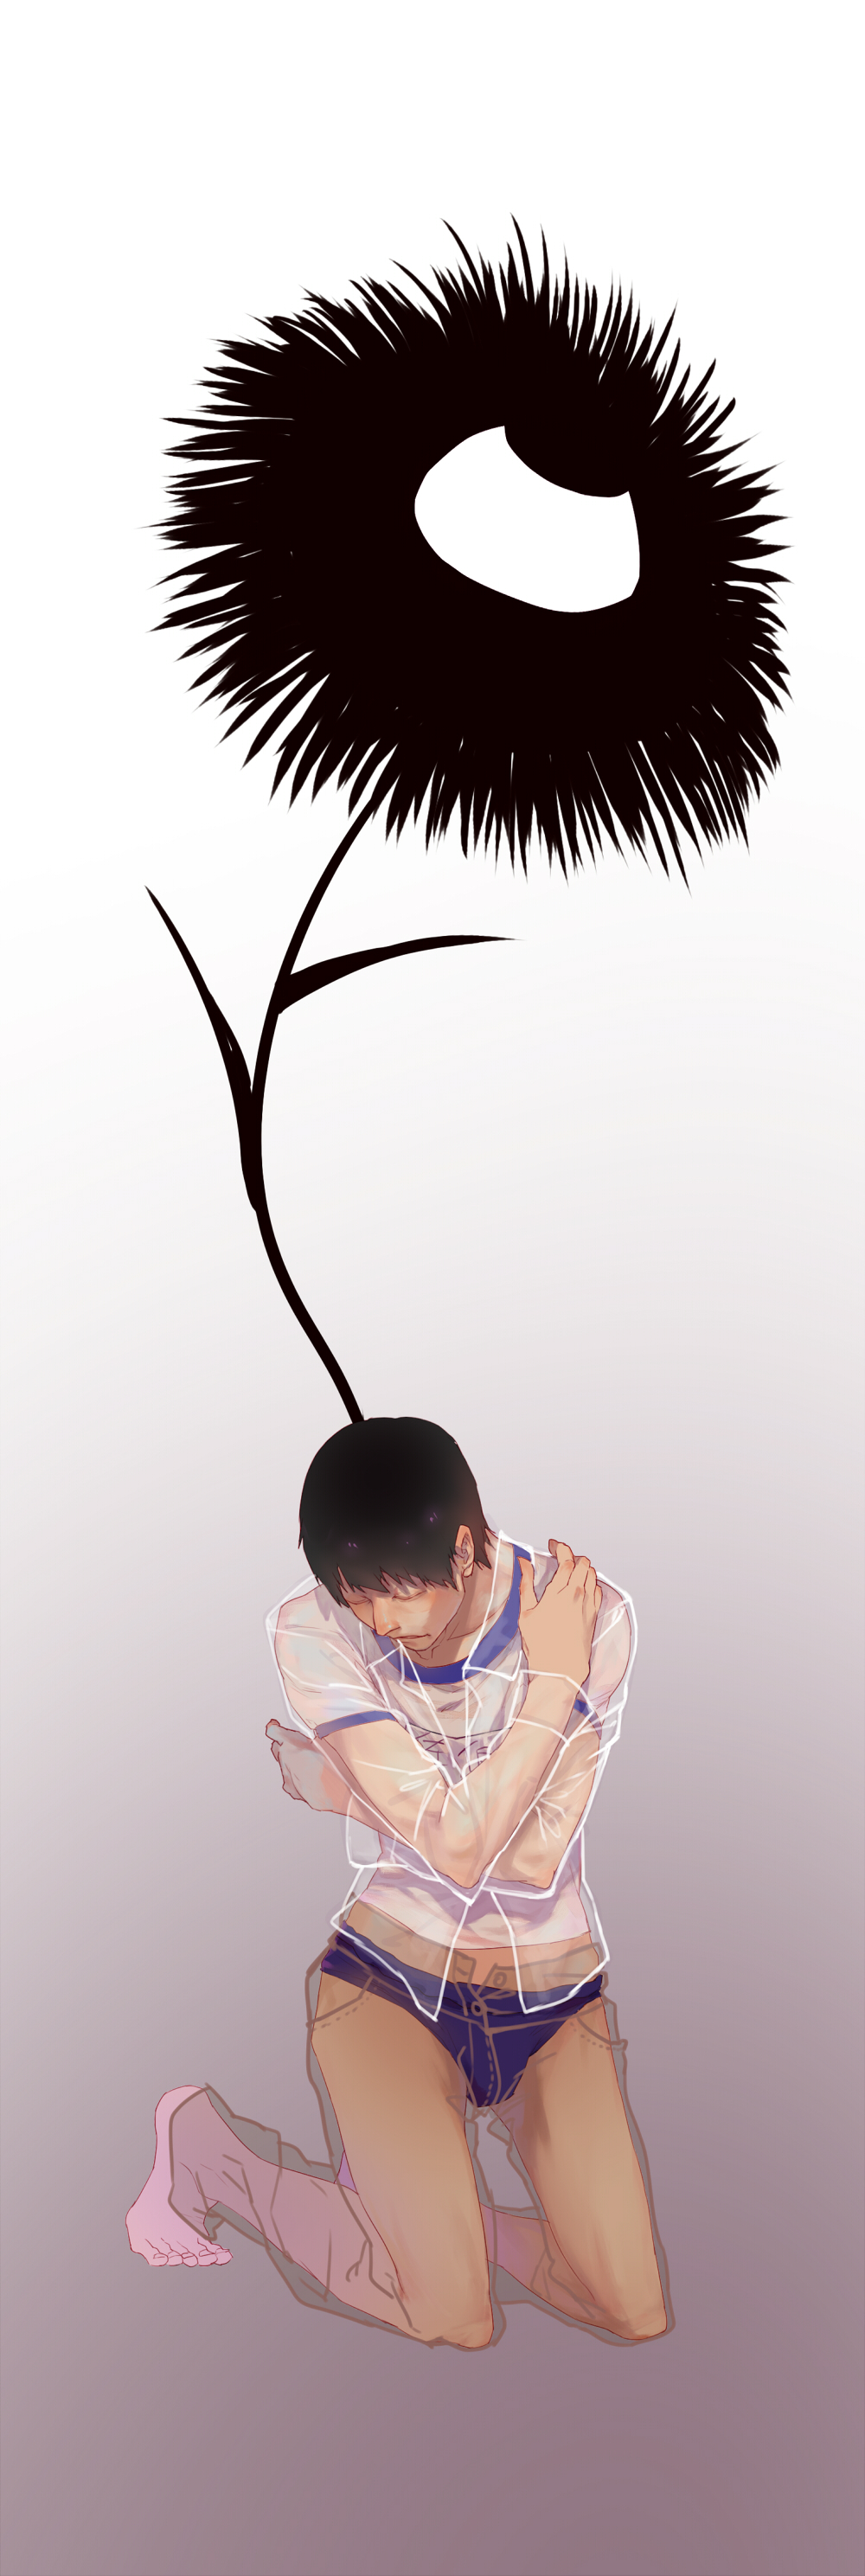 Flowers of Evil/Aku No Hana Aku no hana, Les fleurs du